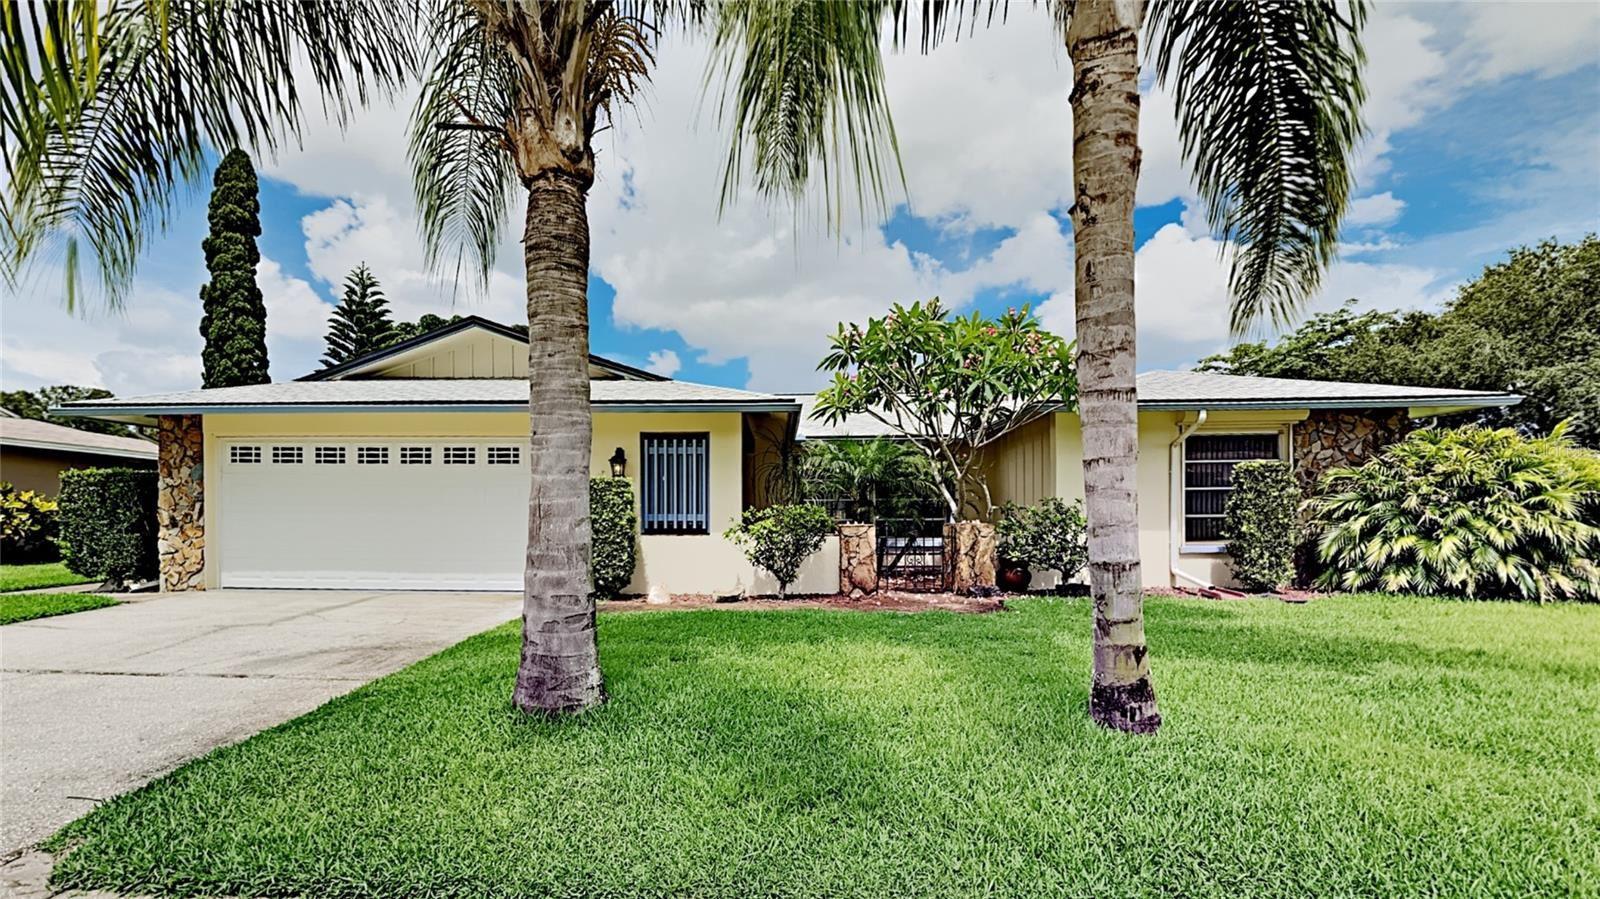 3554 GLOSSY IBIS COURT, Palm Harbor, FL 34683 - #: T3316121